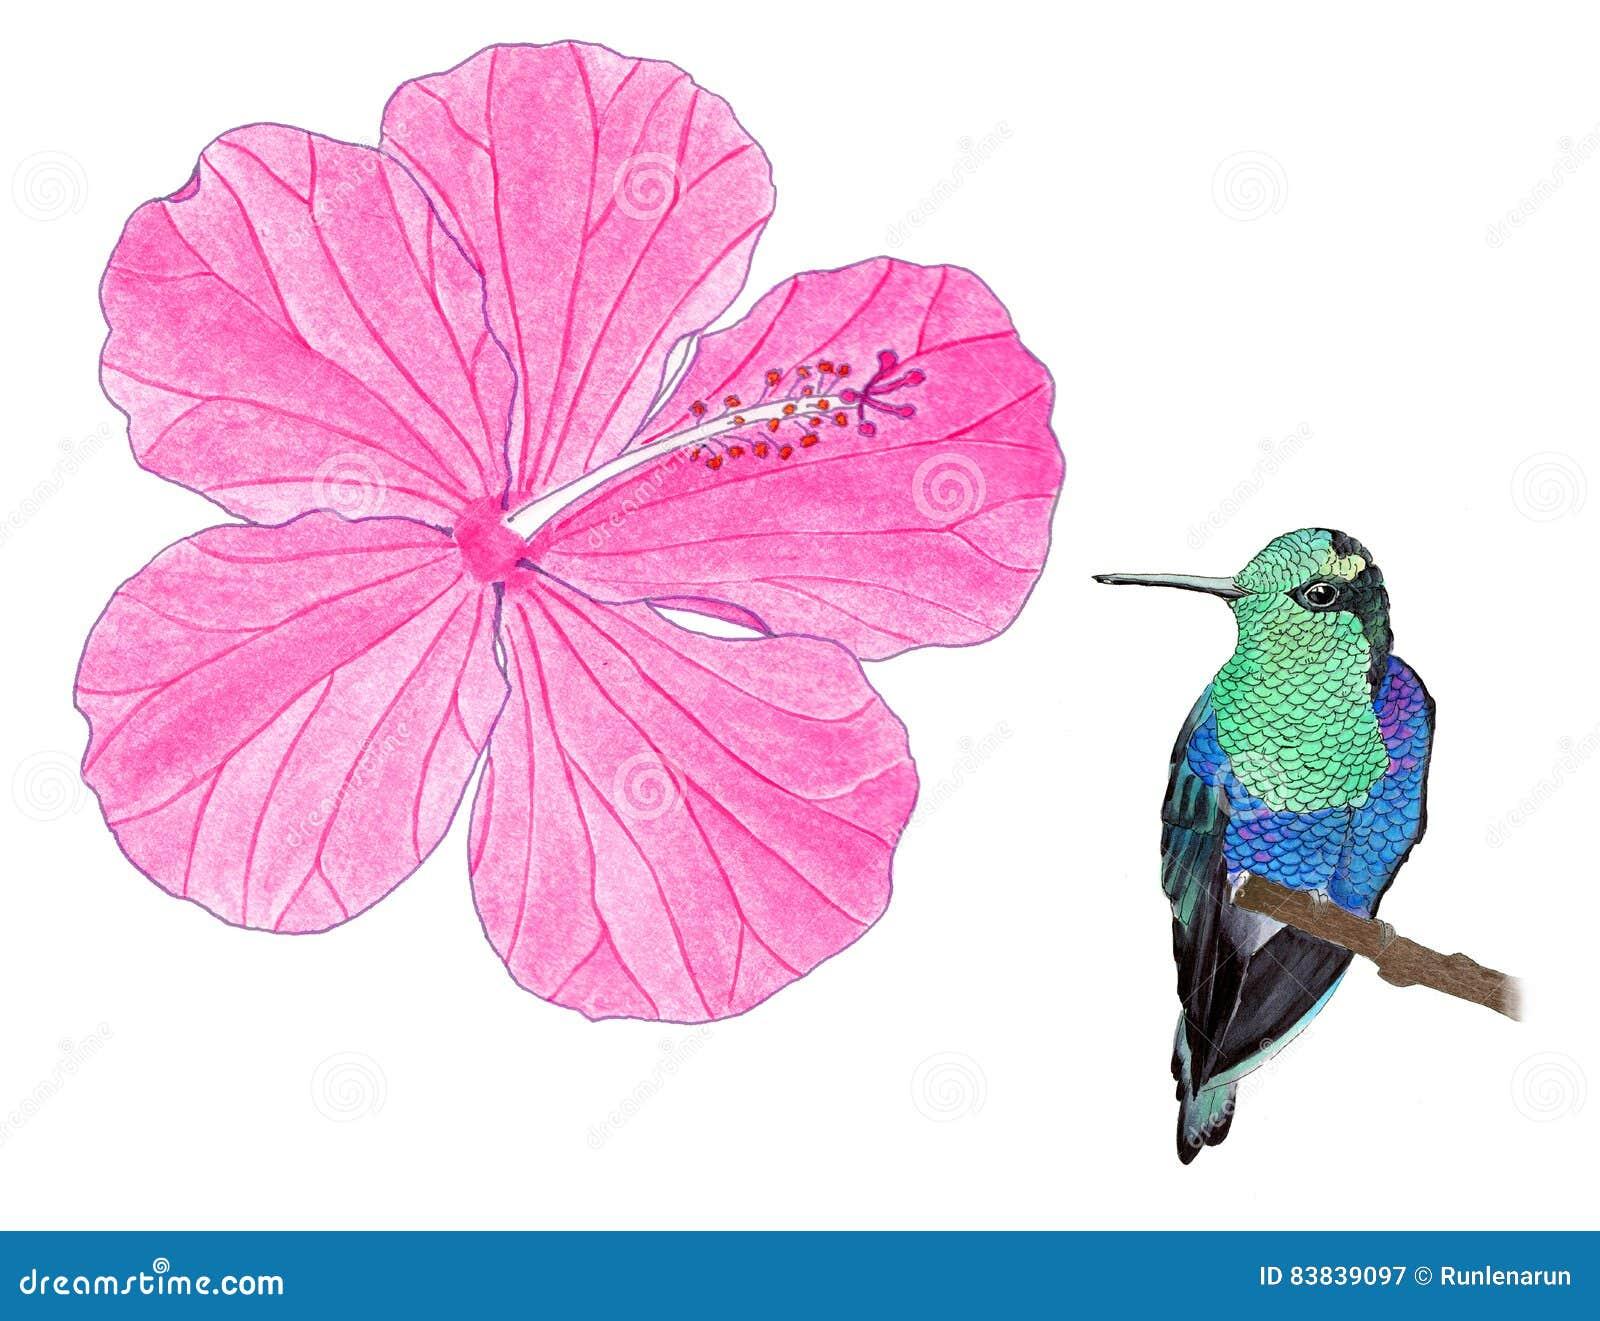 Hummingbird And Hibiscus Watercolor Illustration Stock Illustration